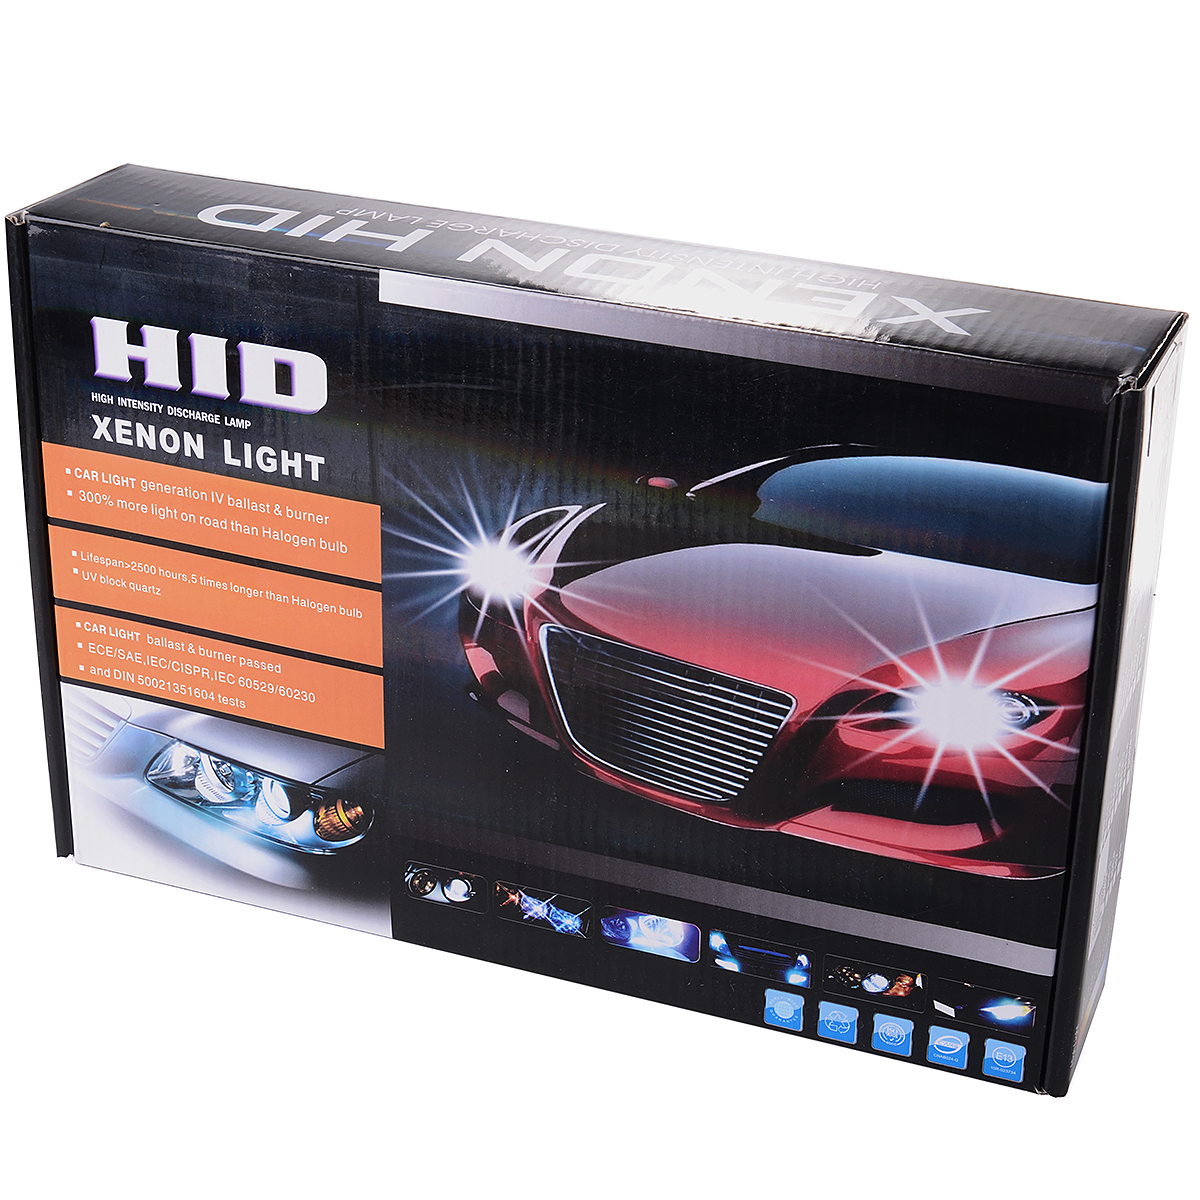 Xcsource 55 Watt Replacement High Intensity HID Kit Conversion Xenon Headlight Lamp Bulbs 8000K Foglight Slim Ballast H7 MA099(China (Mainland))